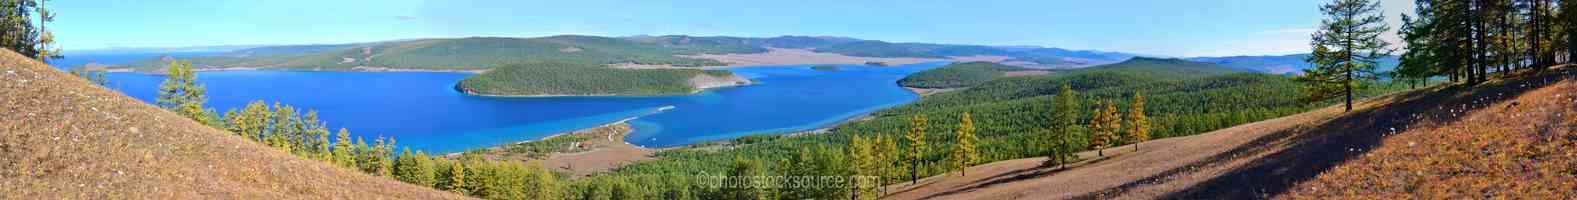 View of Lake Khosvsgol